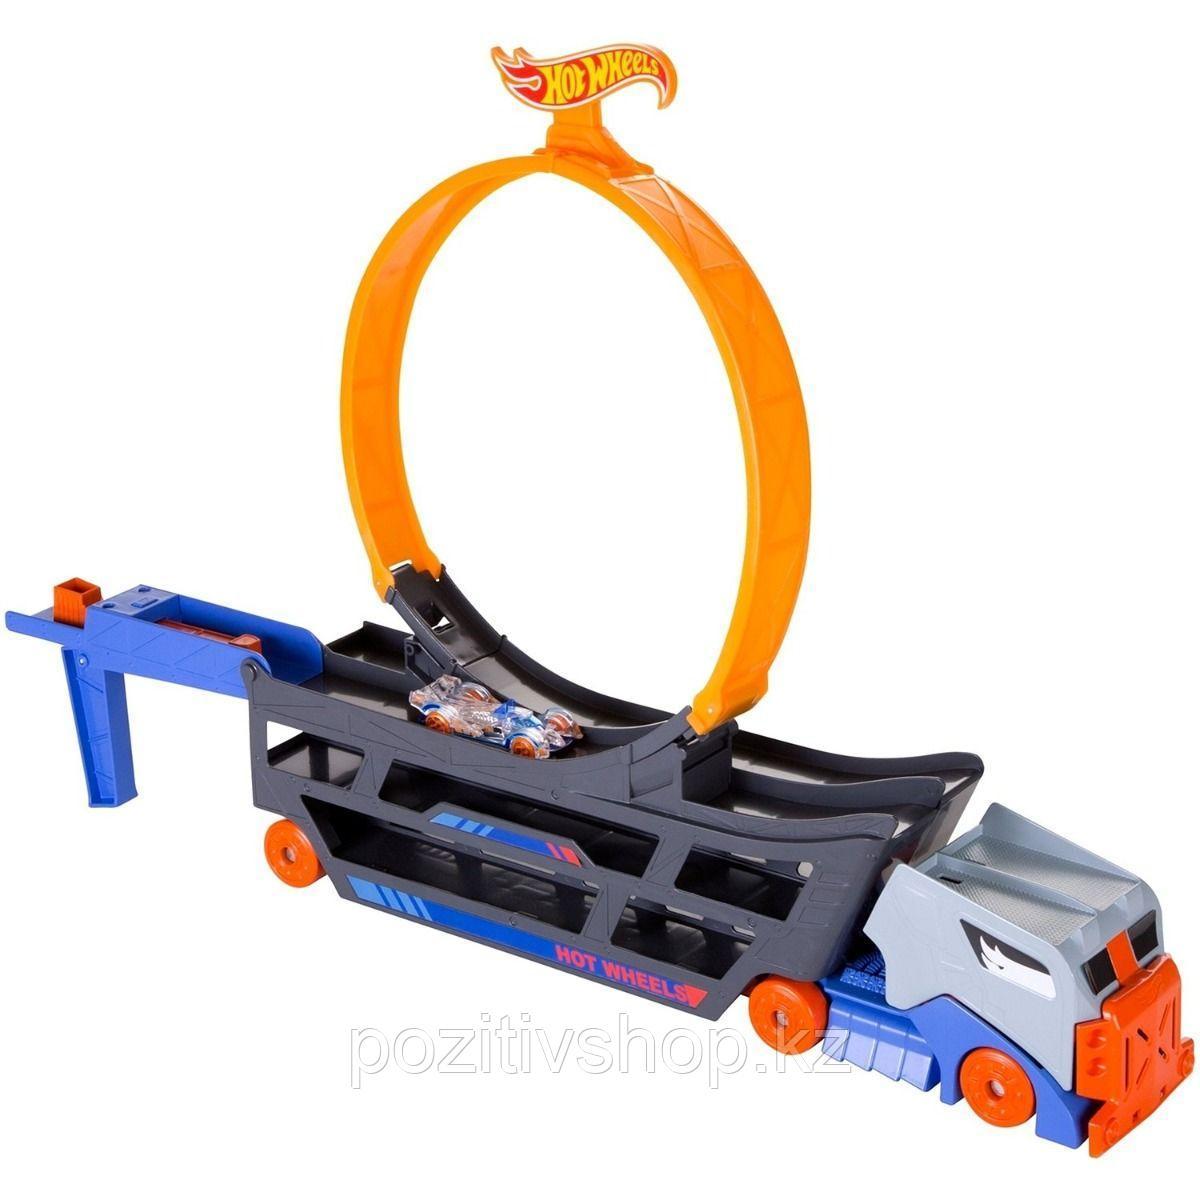 Автовоз-трансформер Hot Wheels Basic - фото 1